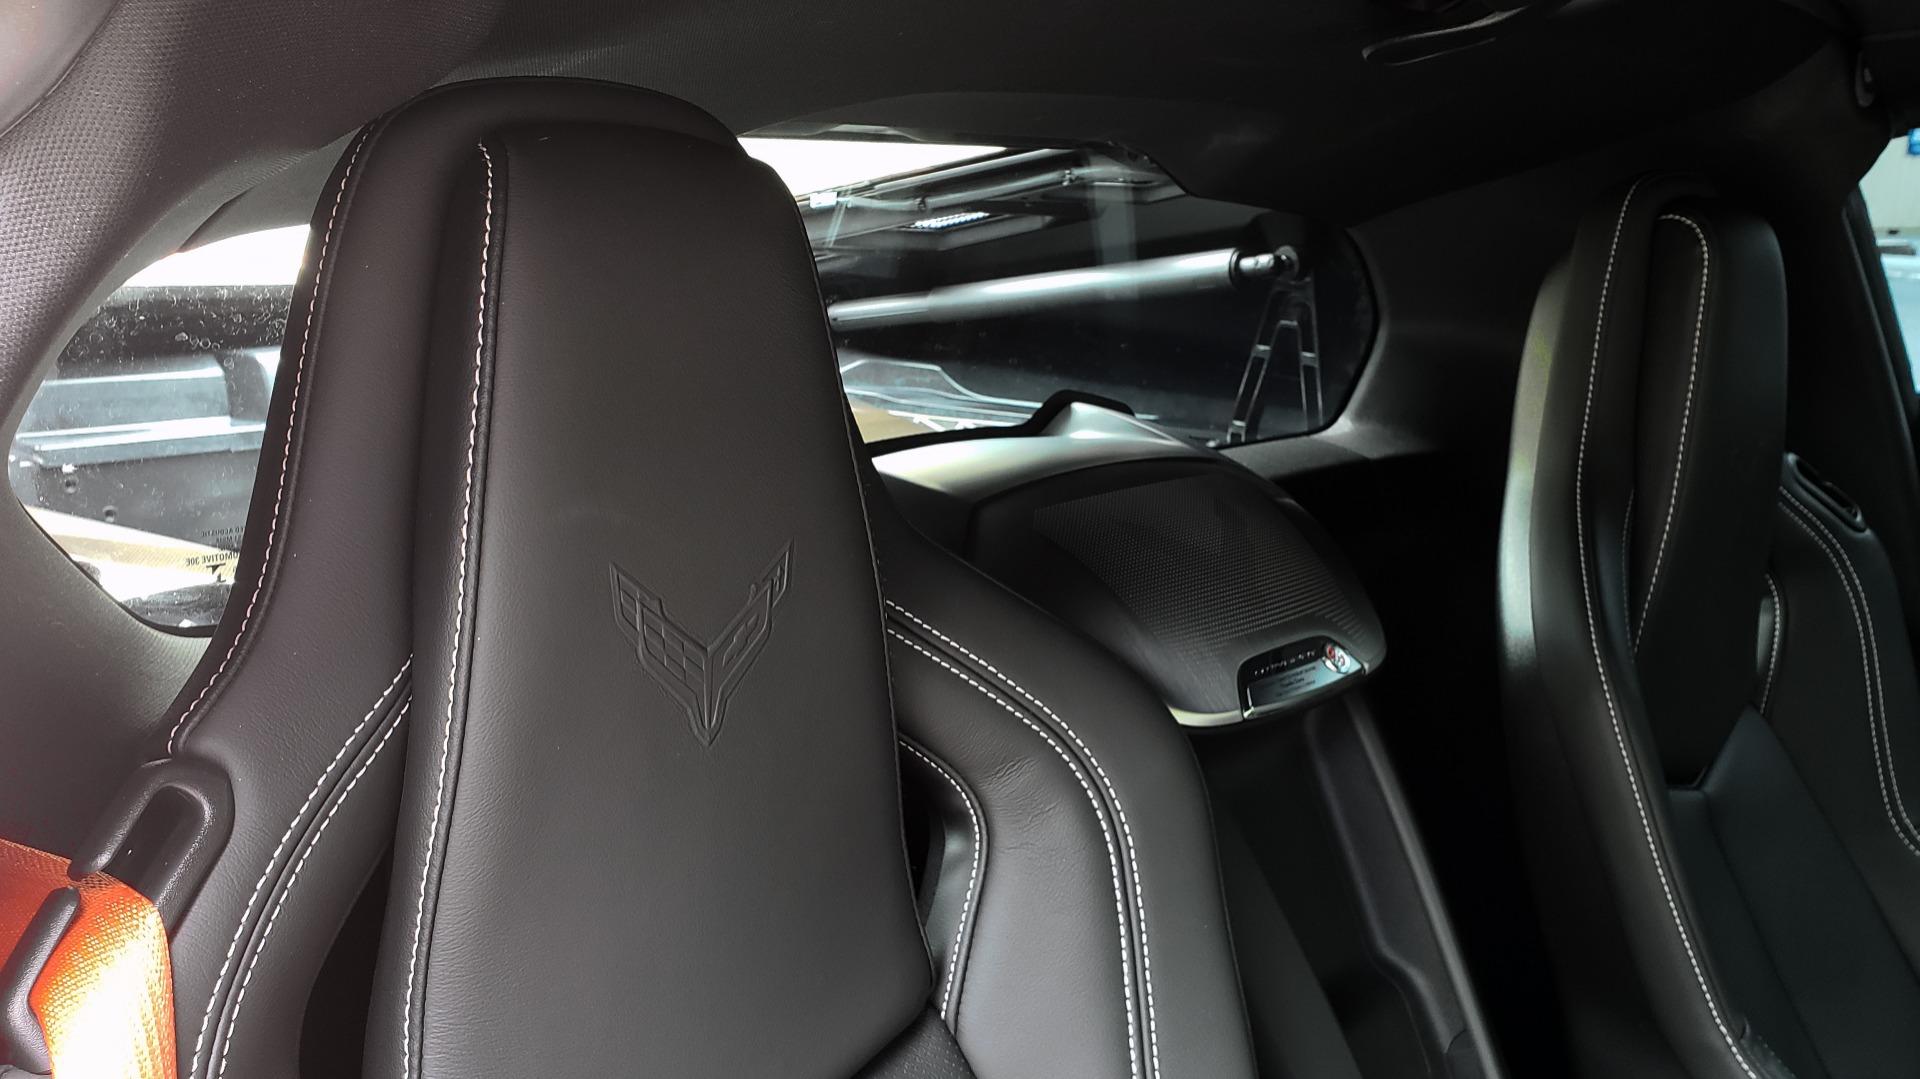 Used 2020 Chevrolet CORVETTE C8 STINGRAY 2LT / 6.2L V8 / 8-SPD AUTO / NAV / BOSE / REARVIEW / DATA RECOR for sale Sold at Formula Imports in Charlotte NC 28227 66